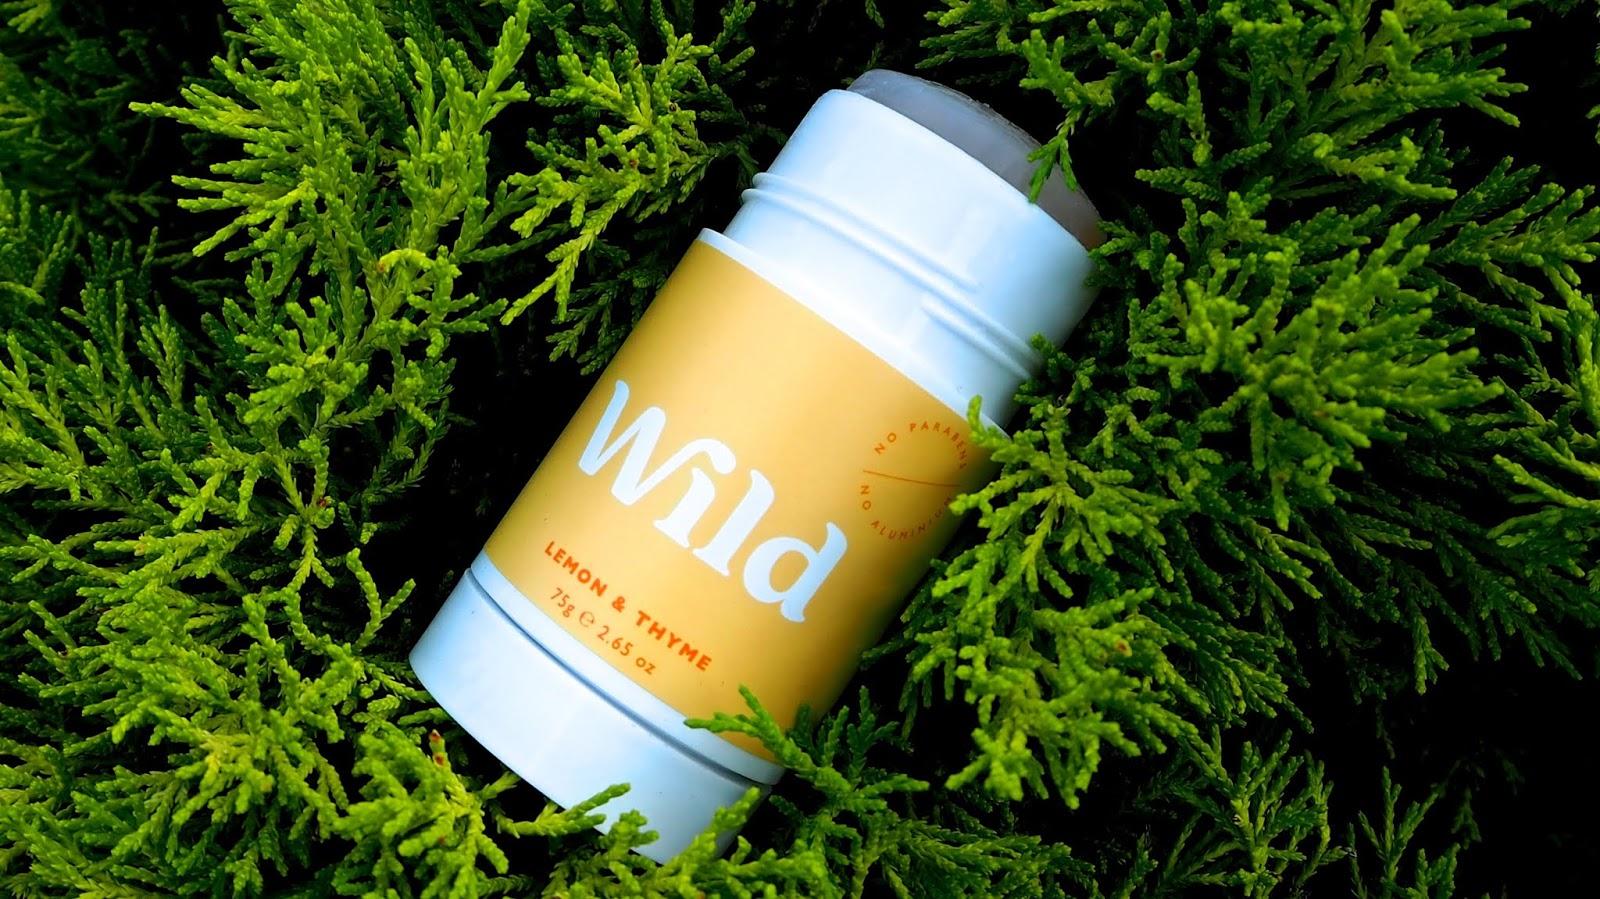 Wild Lemon & Thyme Deodorant